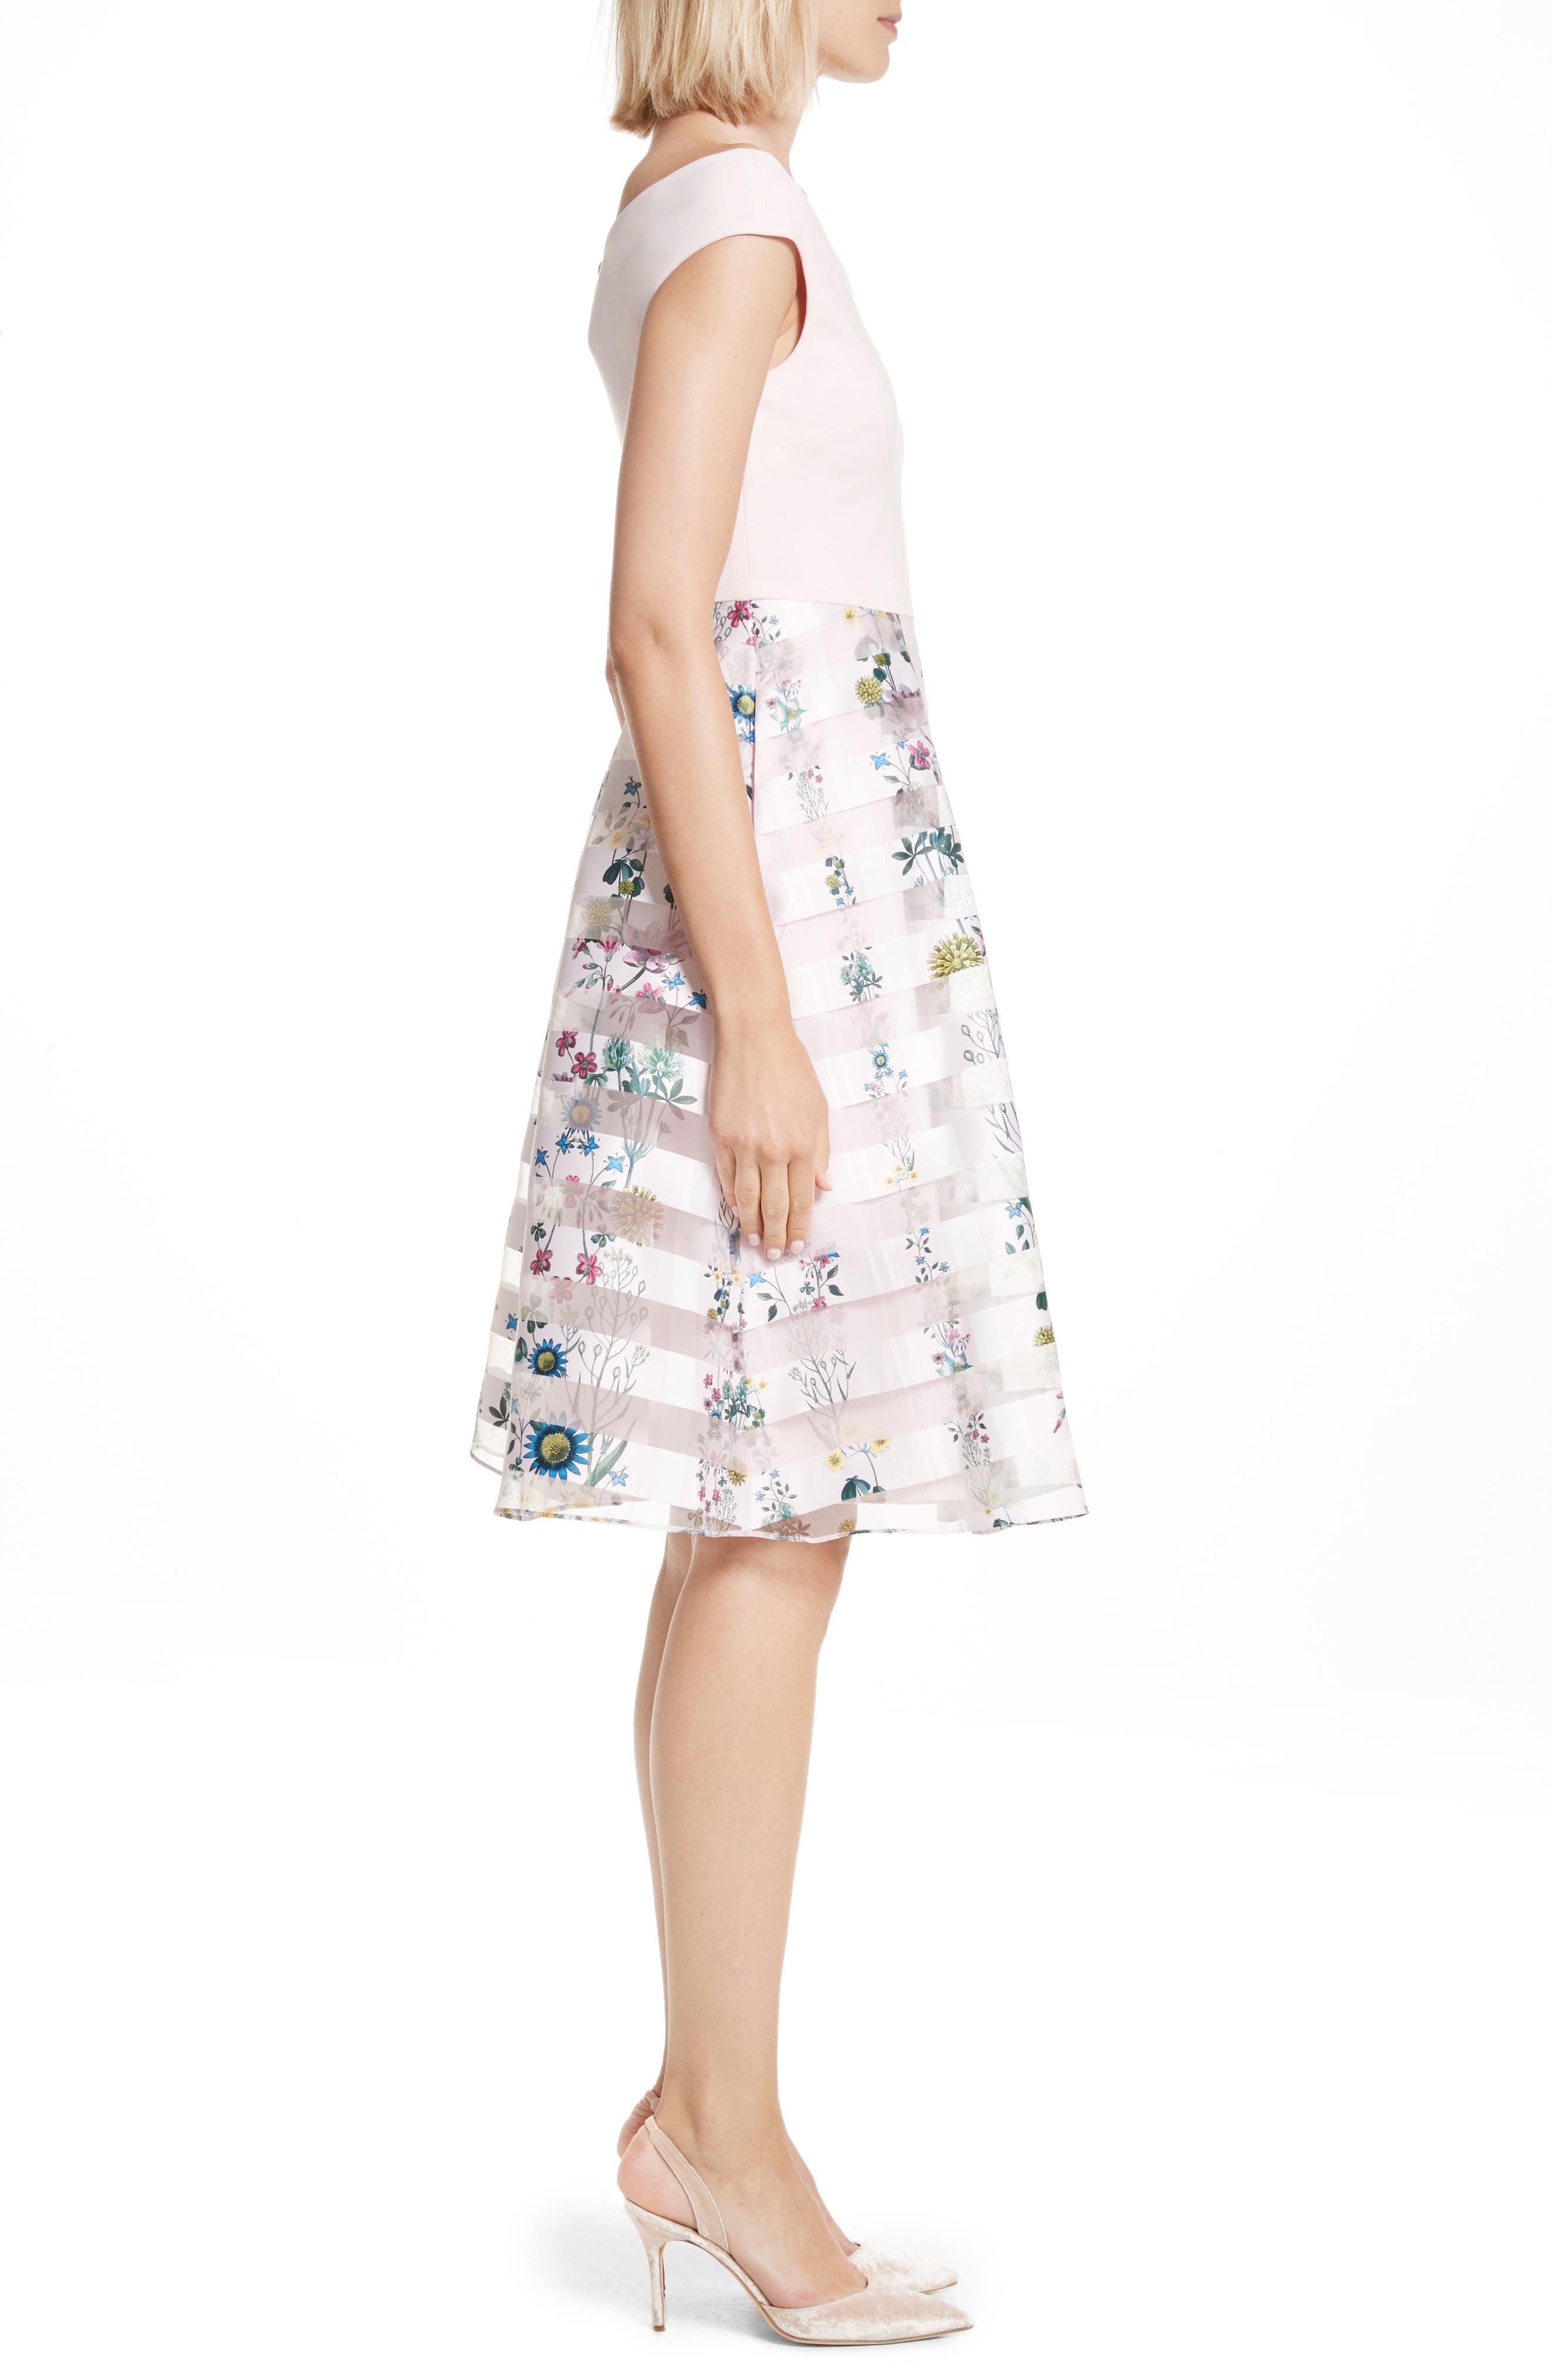 Lulou Unity Floral Off the Shoulder Dress,                             Alternate thumbnail 3, color,                             672